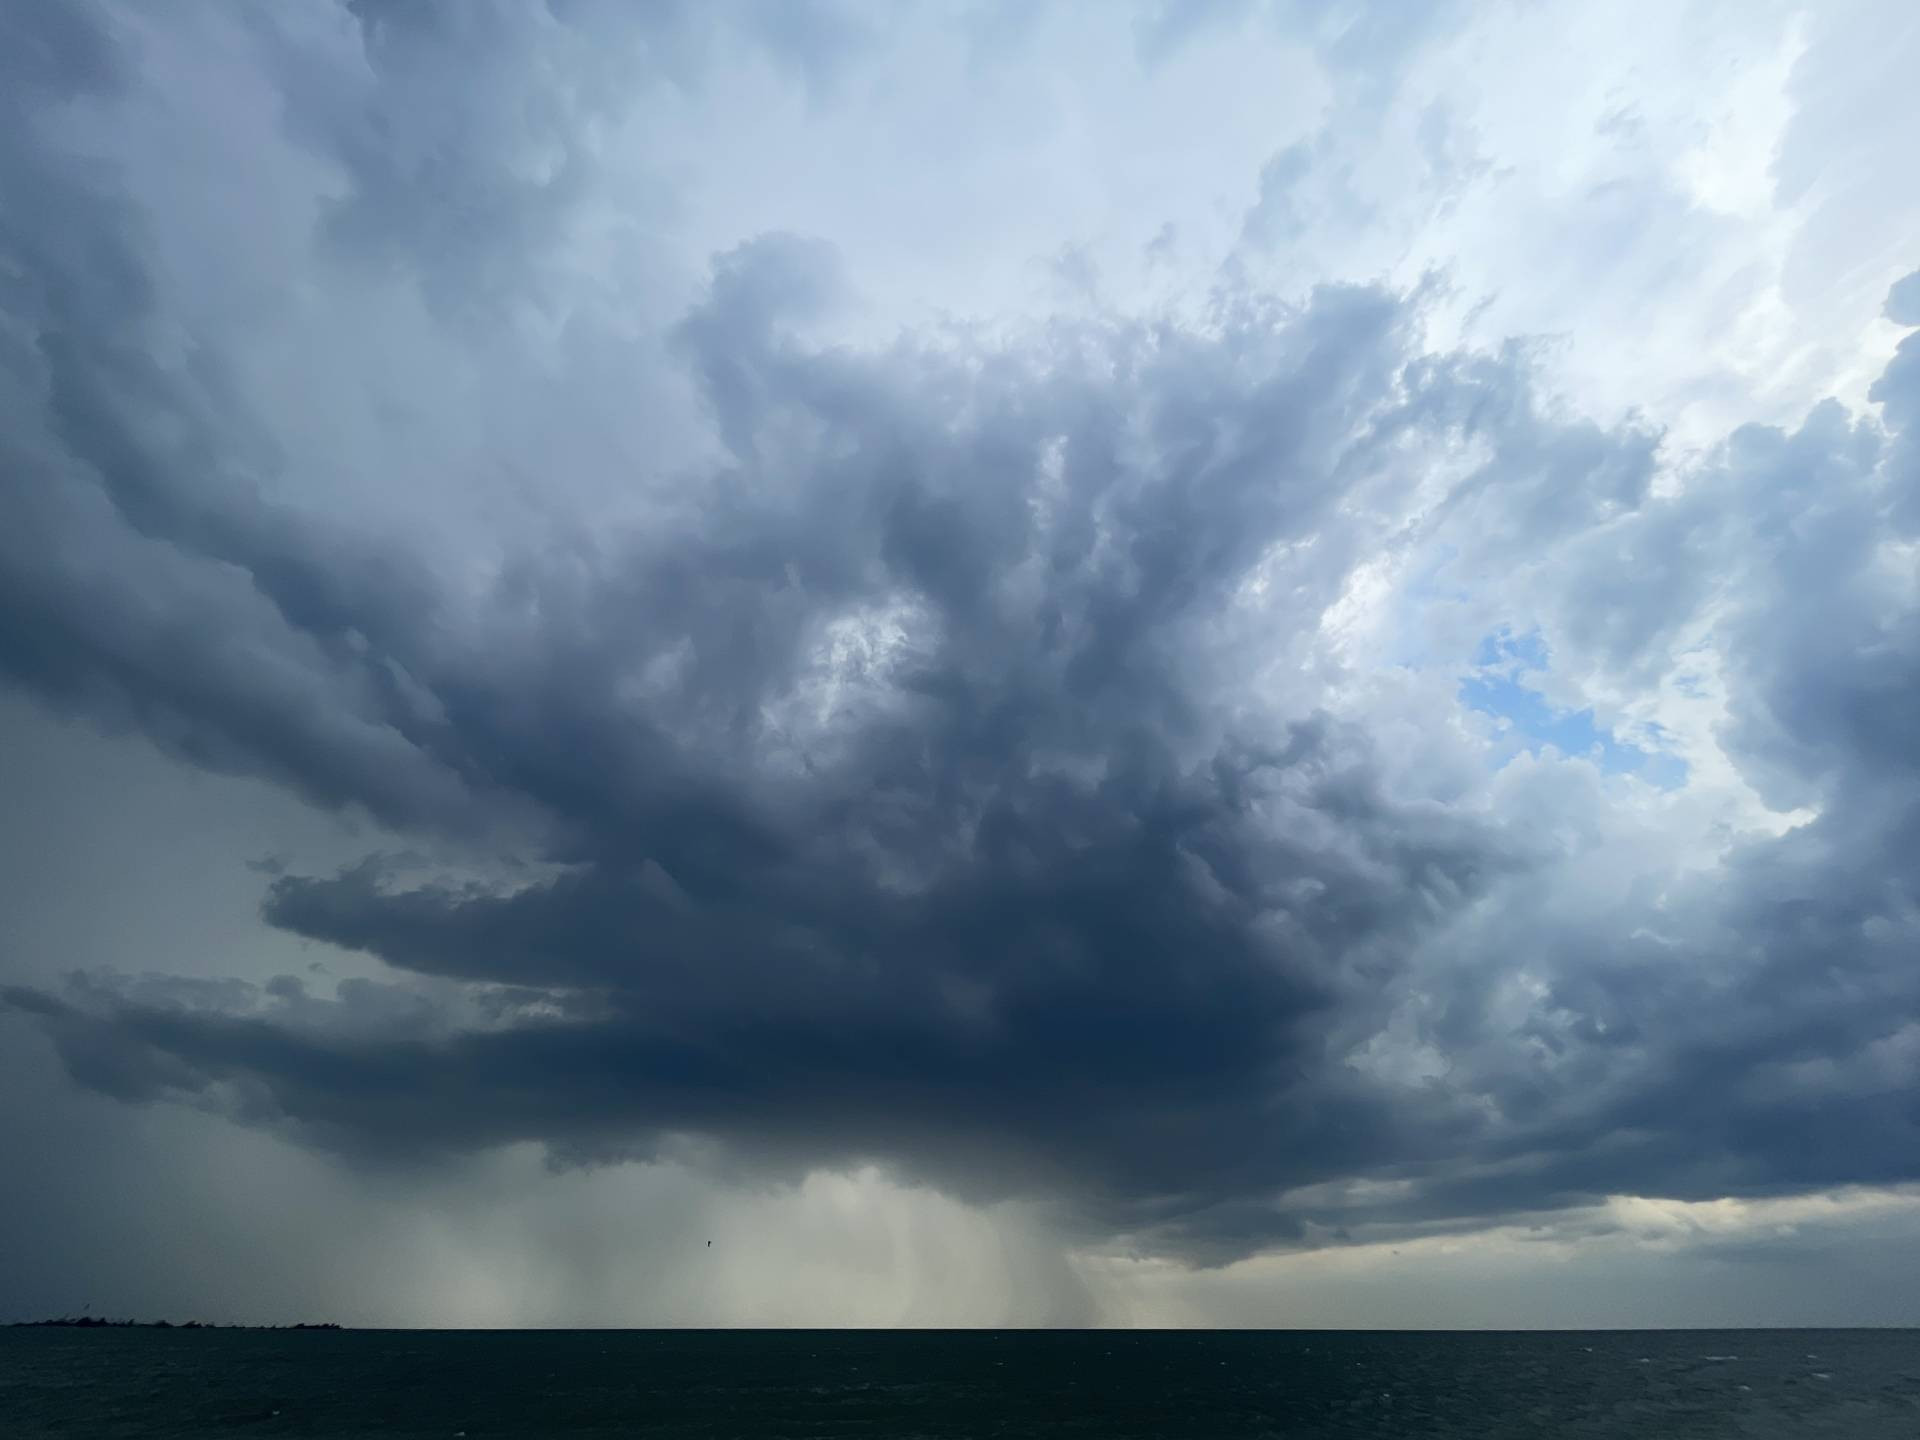 Southampton, ON 05:01 PM #ONstorm